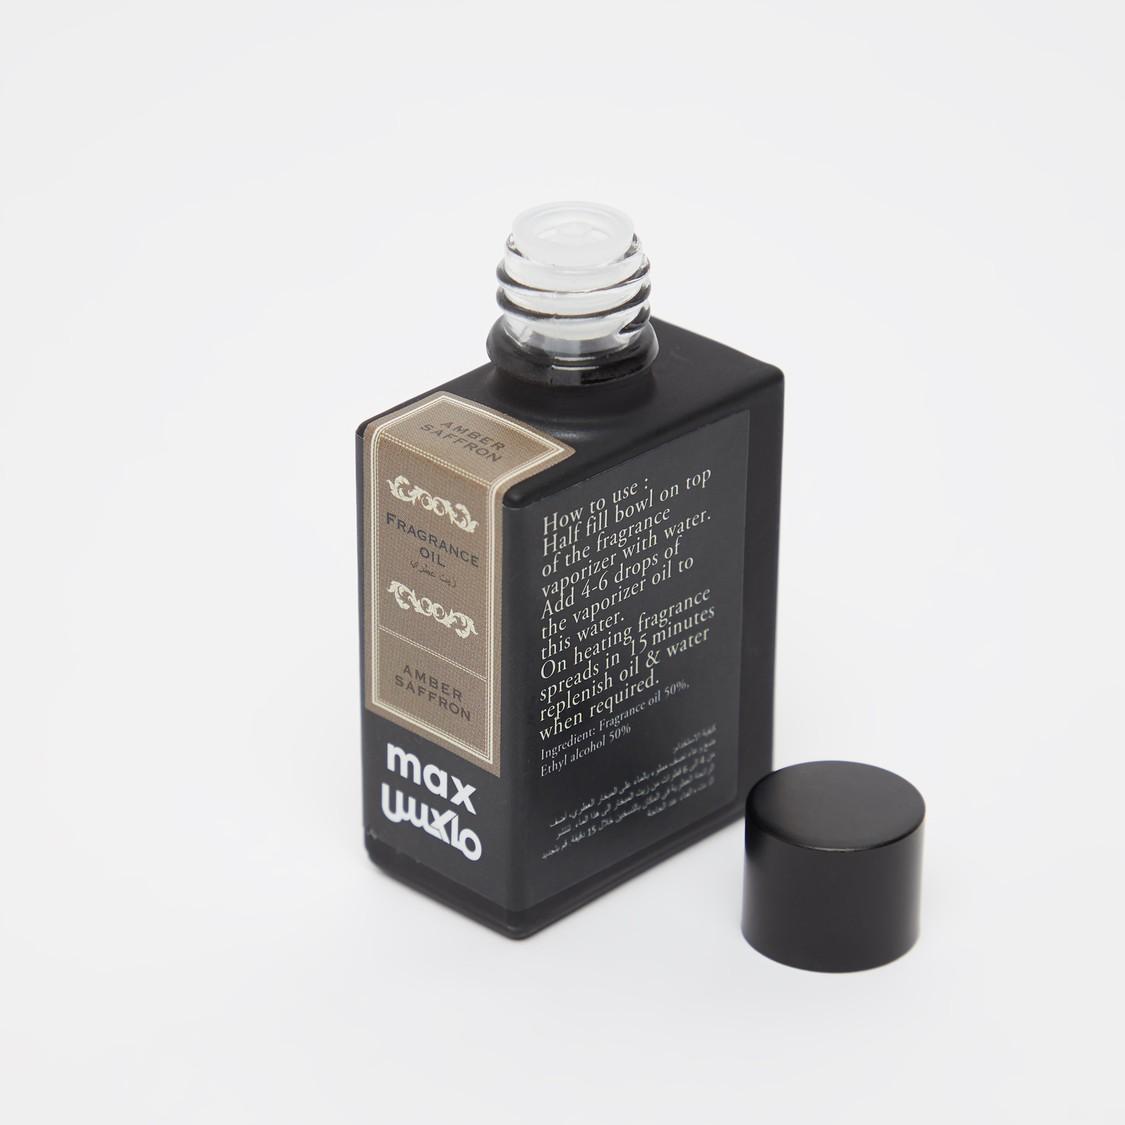 Fragrance Oil Amber Saffron